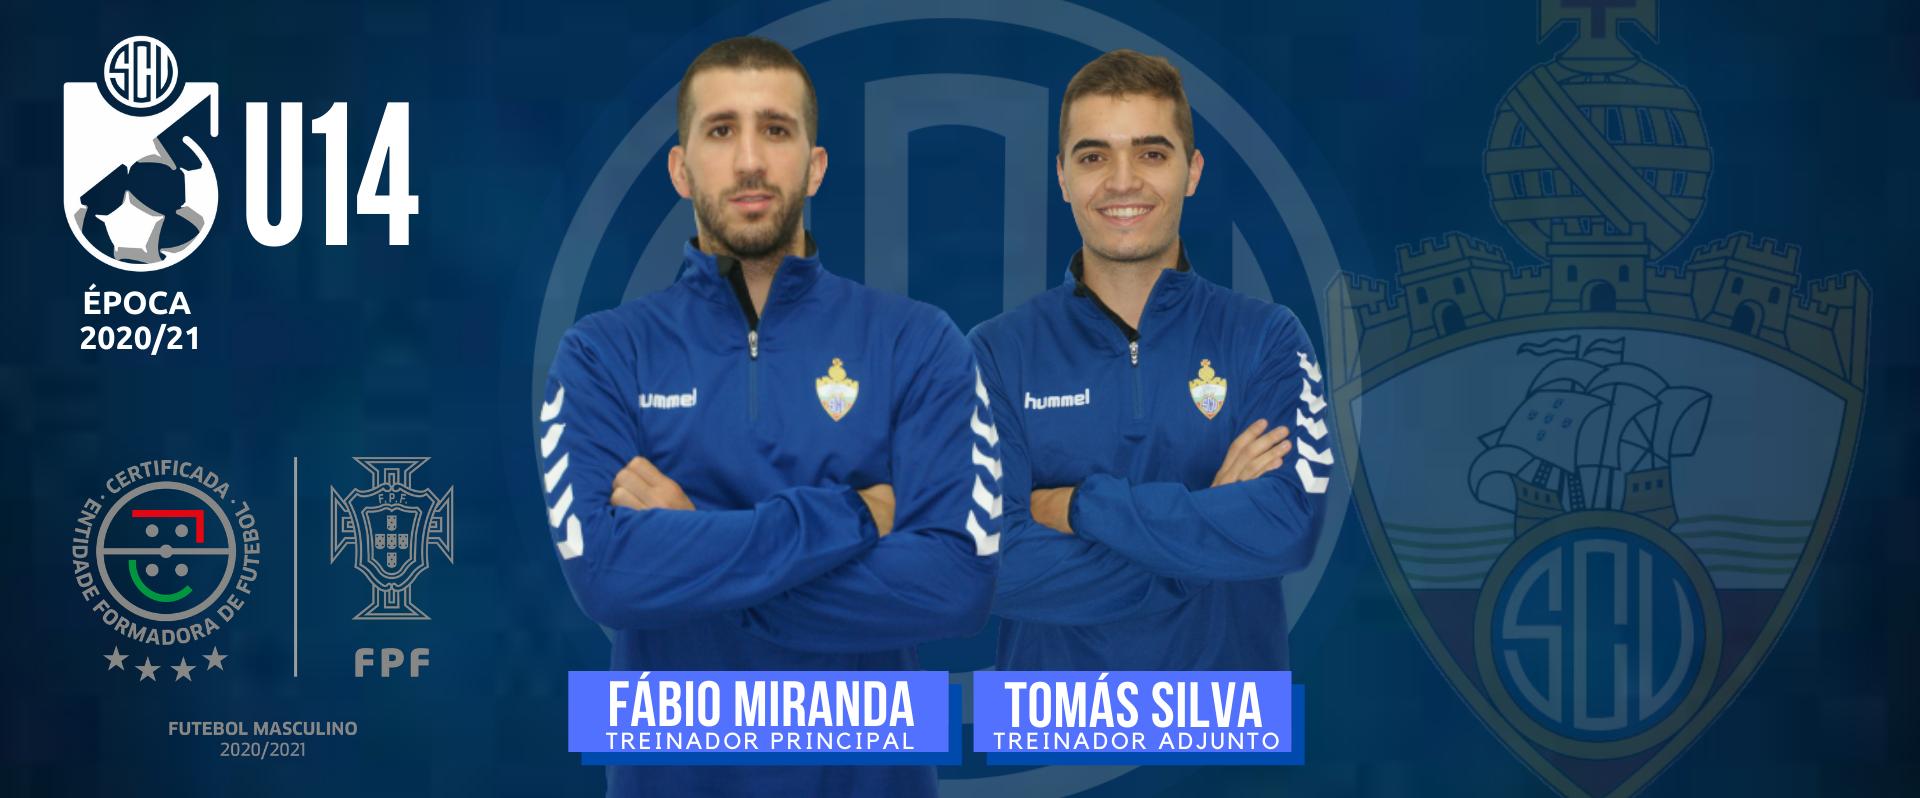 Fábio Miranda e Tomás Silva nos U14!